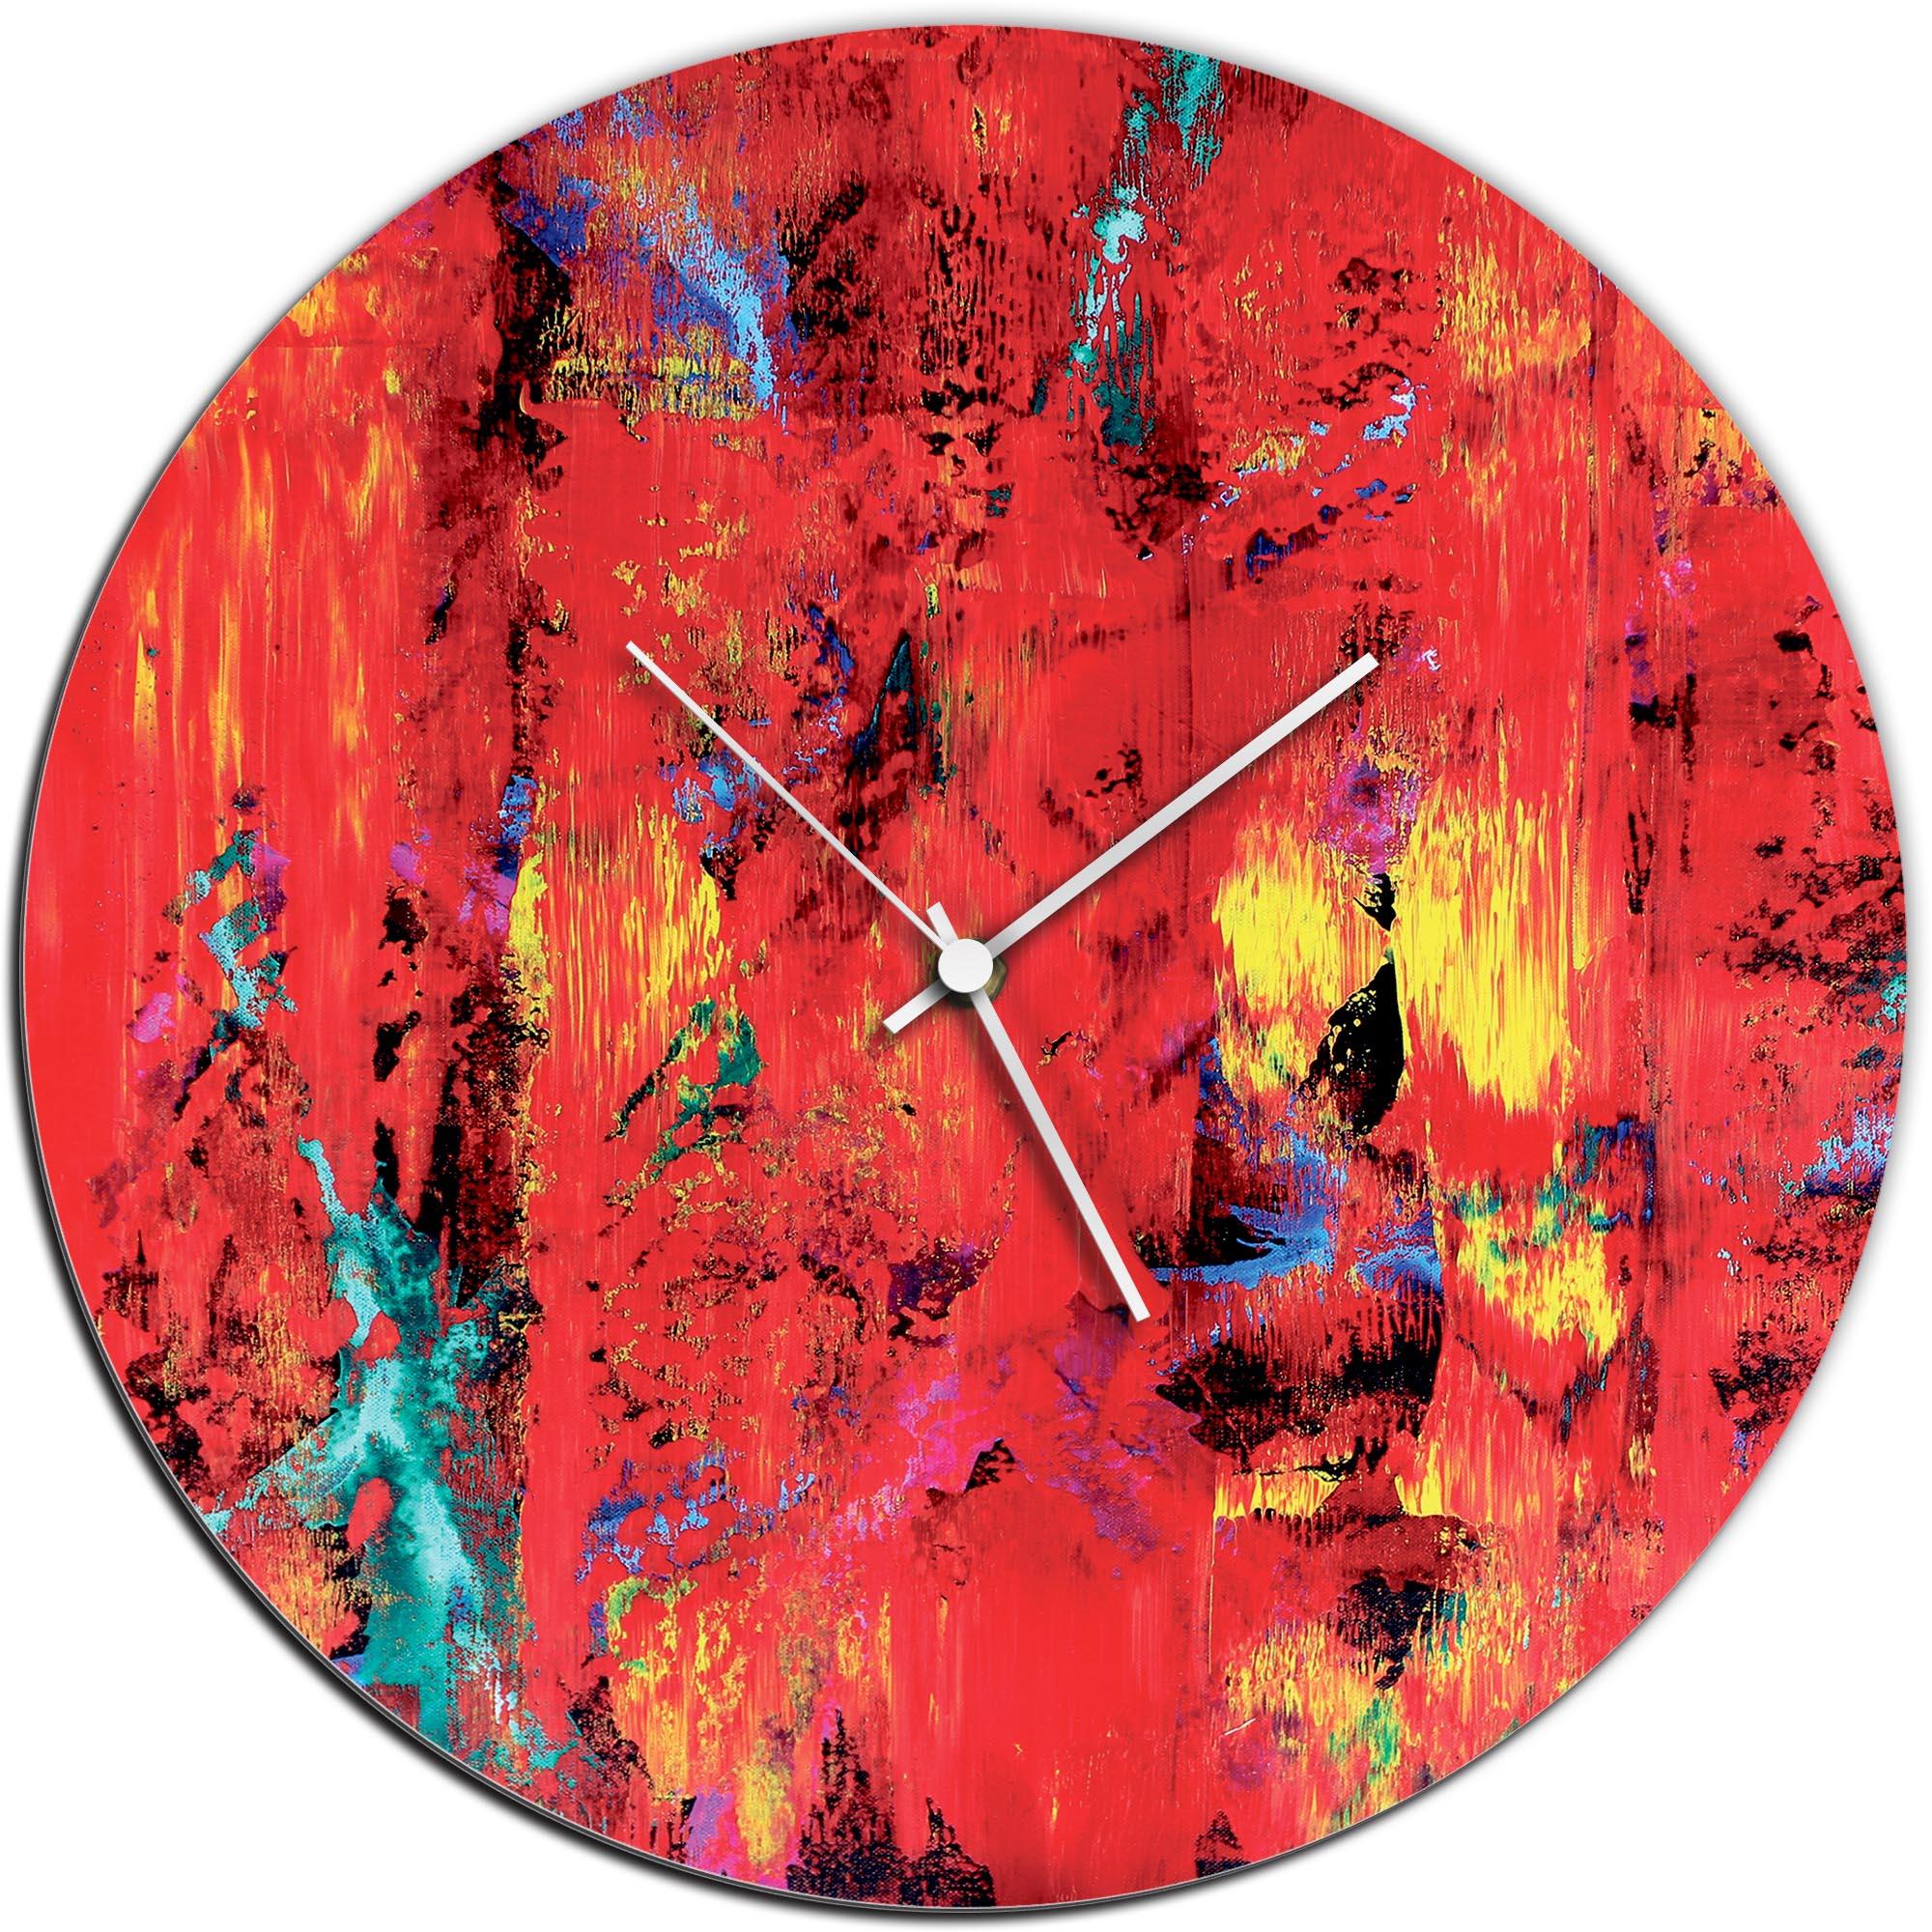 Mendo Vasilevski 'City Colors Circle Clock' 16in x 16in Modern Wall Clock on Aluminum Composite